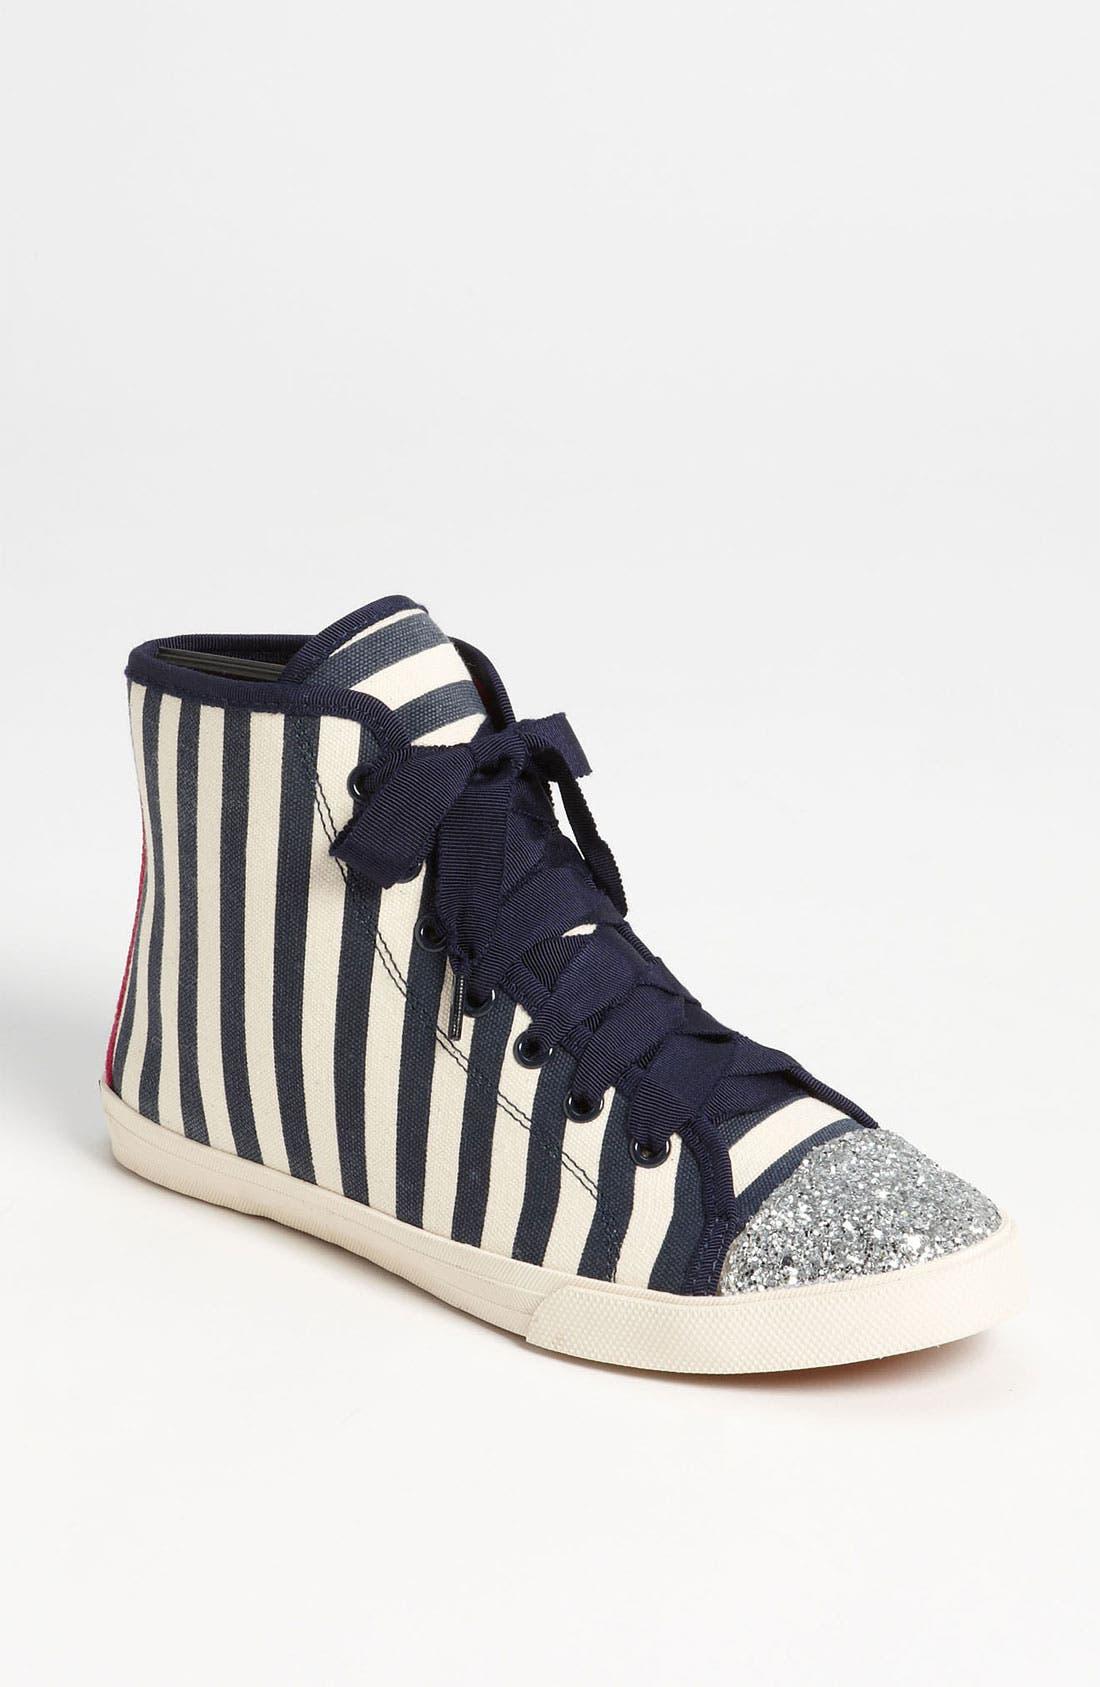 Alternate Image 1 Selected - kate spade new york 'lorna' sneaker